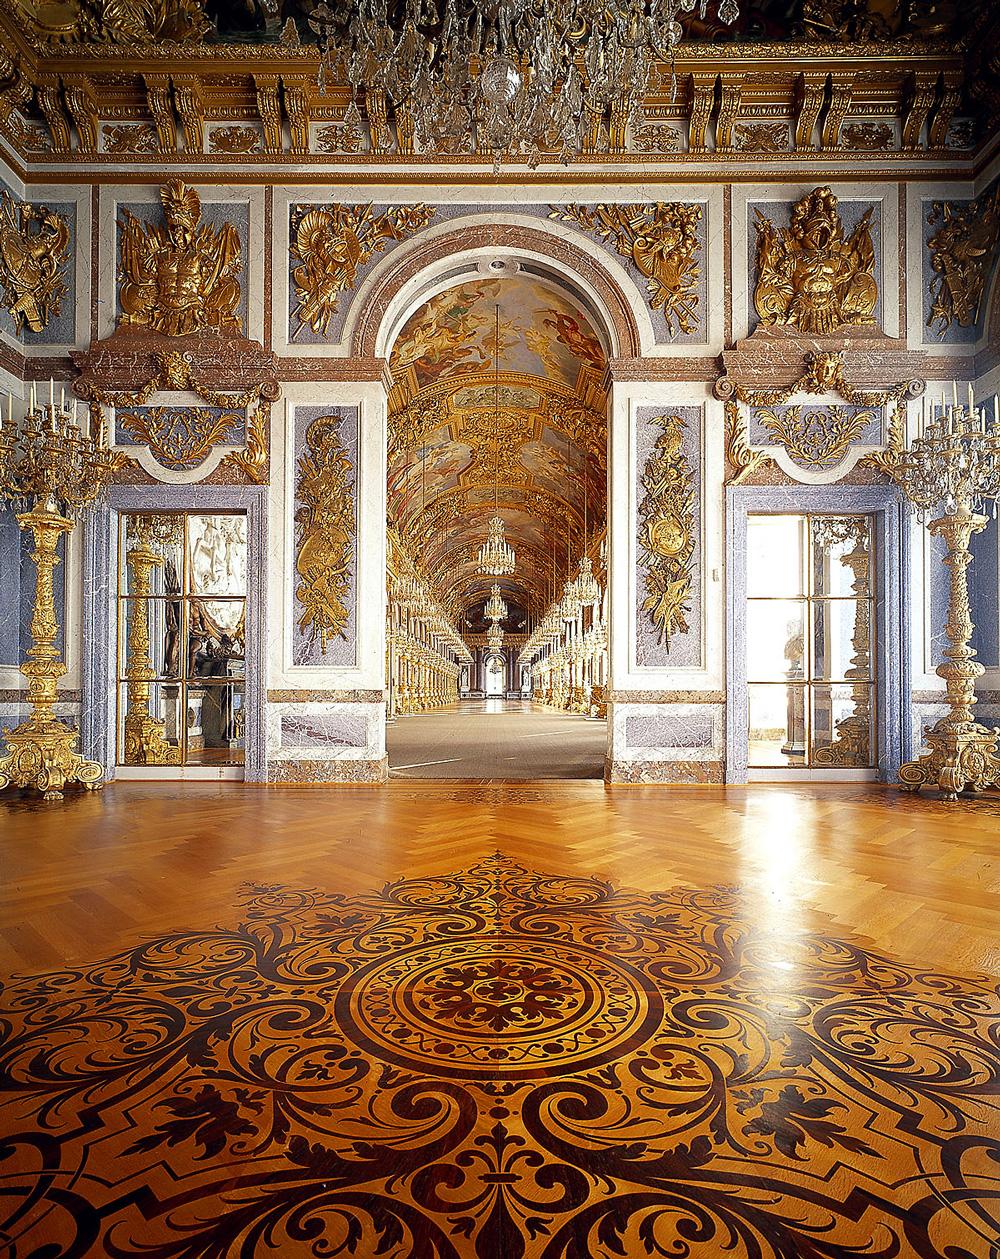 Дворец Херренкимзее (Neues Schloss Herrenchiemsee). Большая зеркальная галерея. Анфилада.